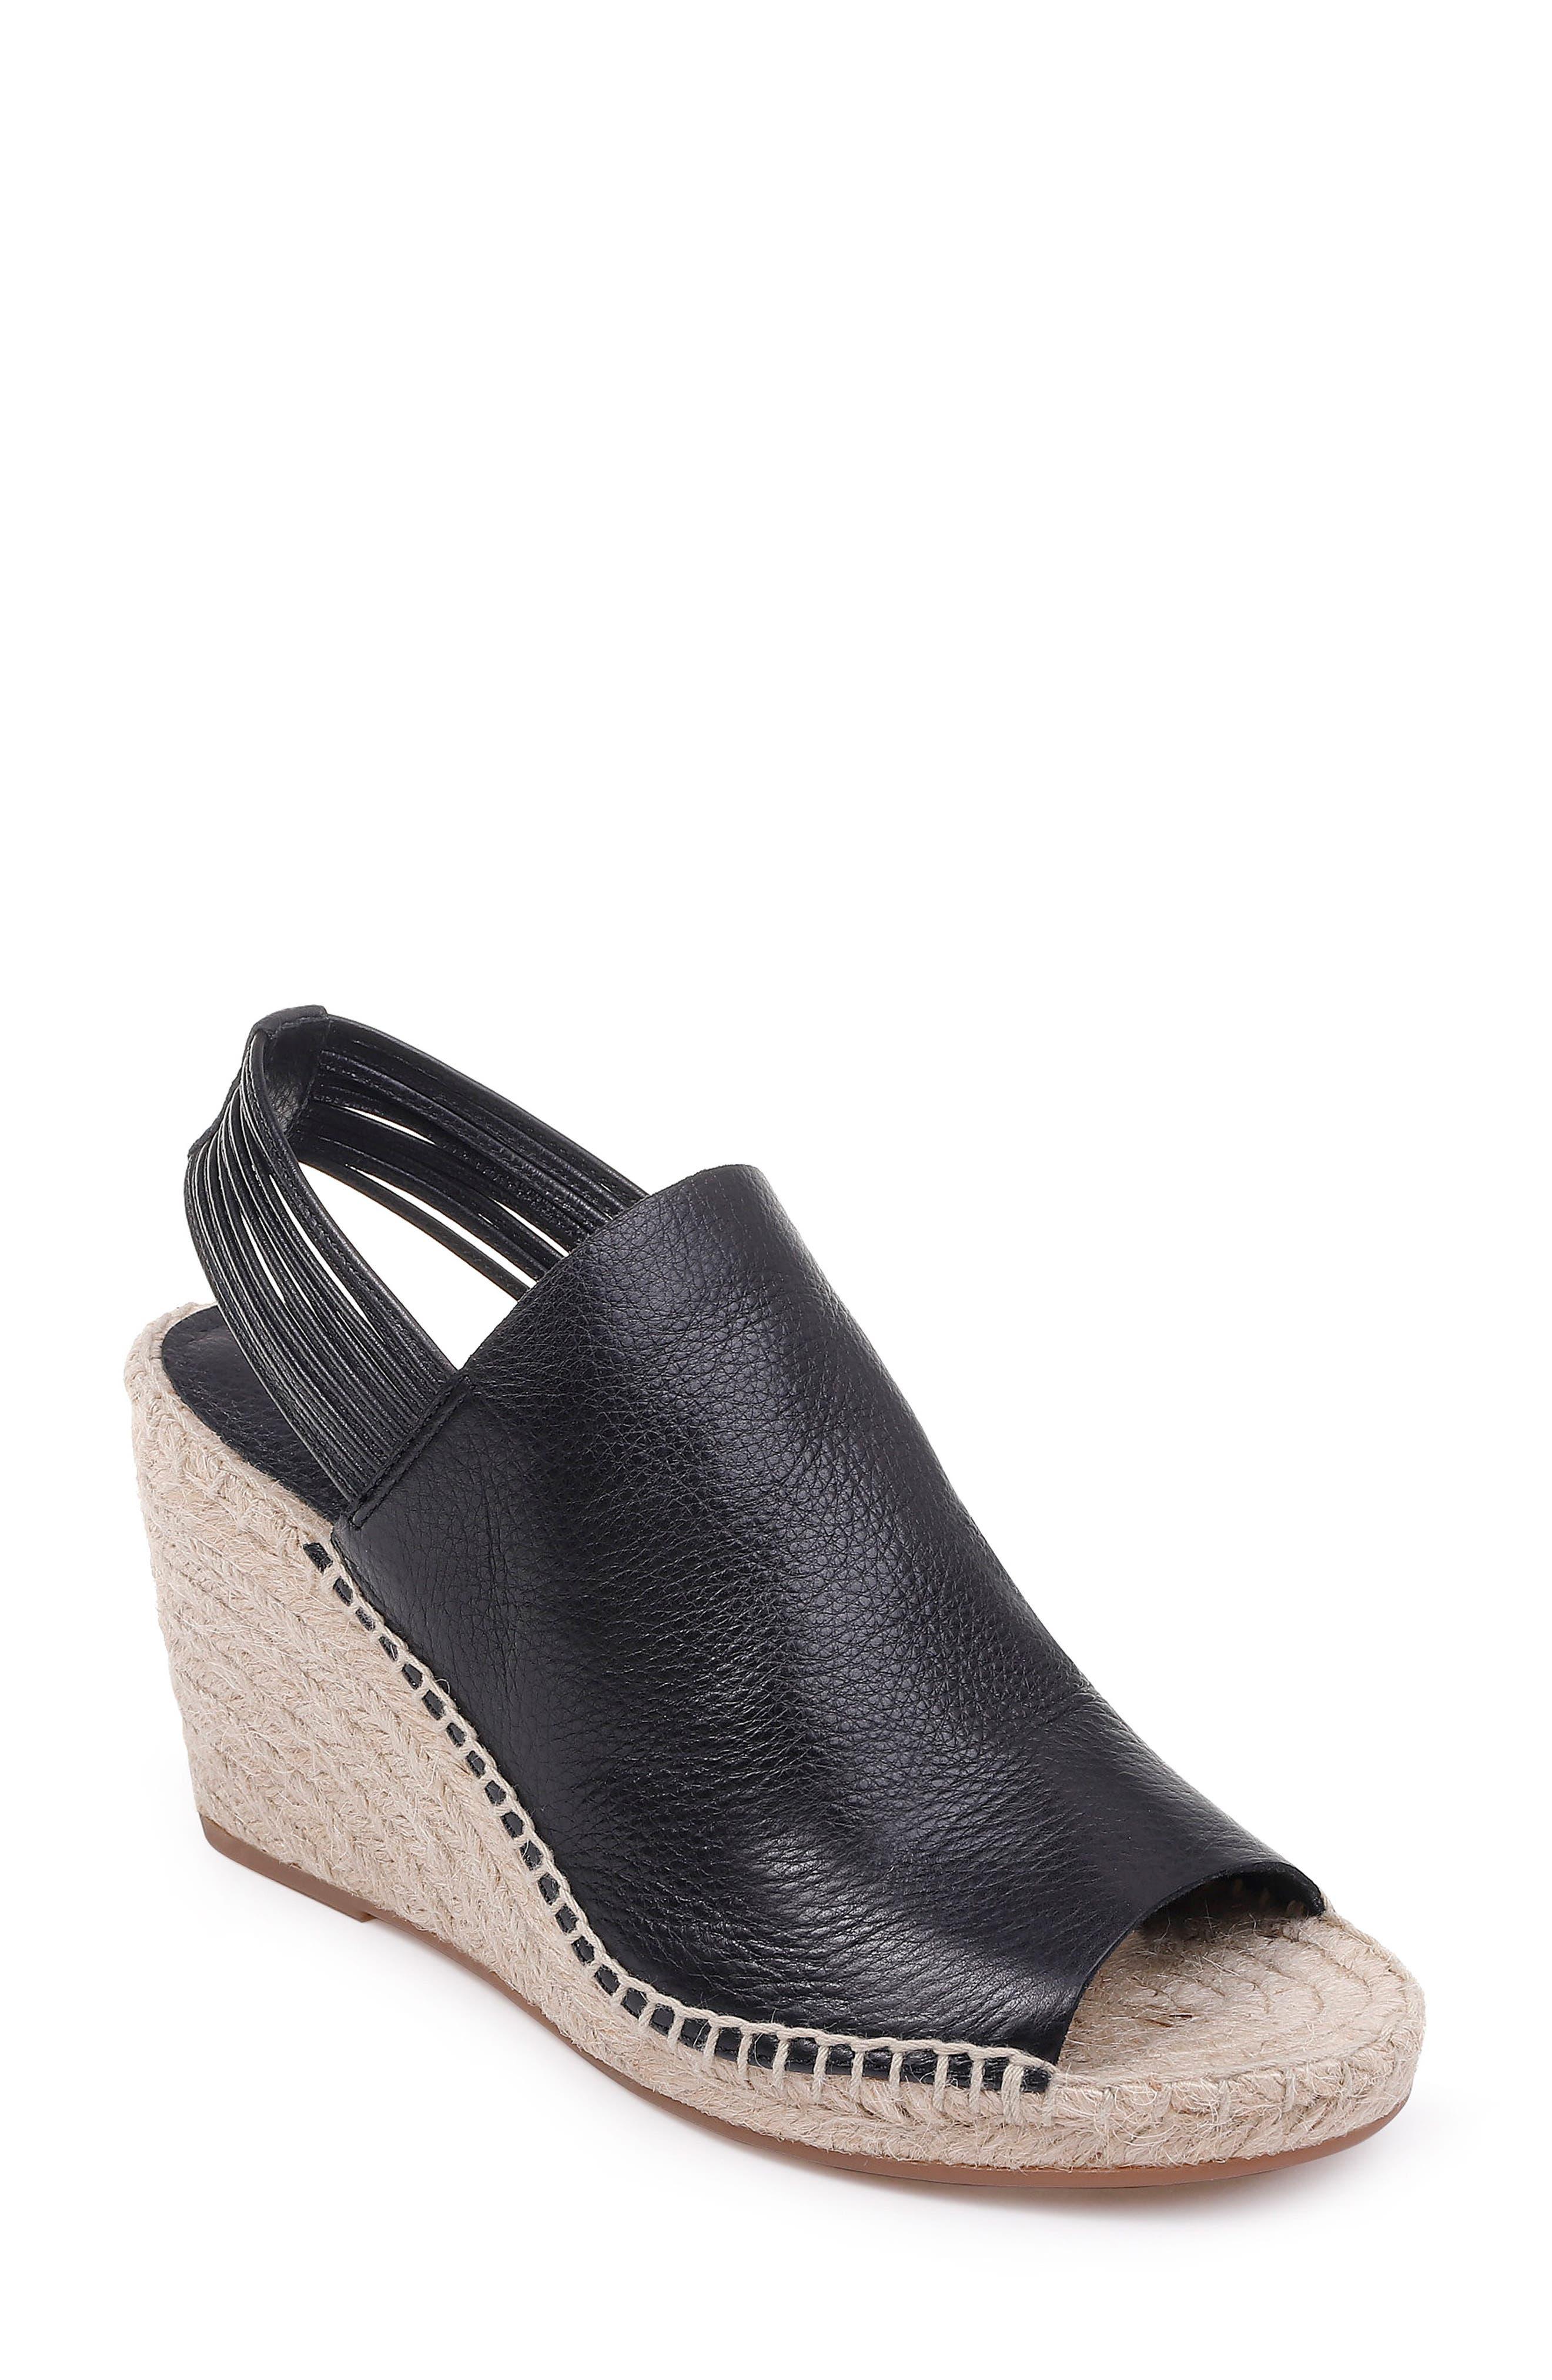 Splendid Simon Espadrille Wedge Sandal